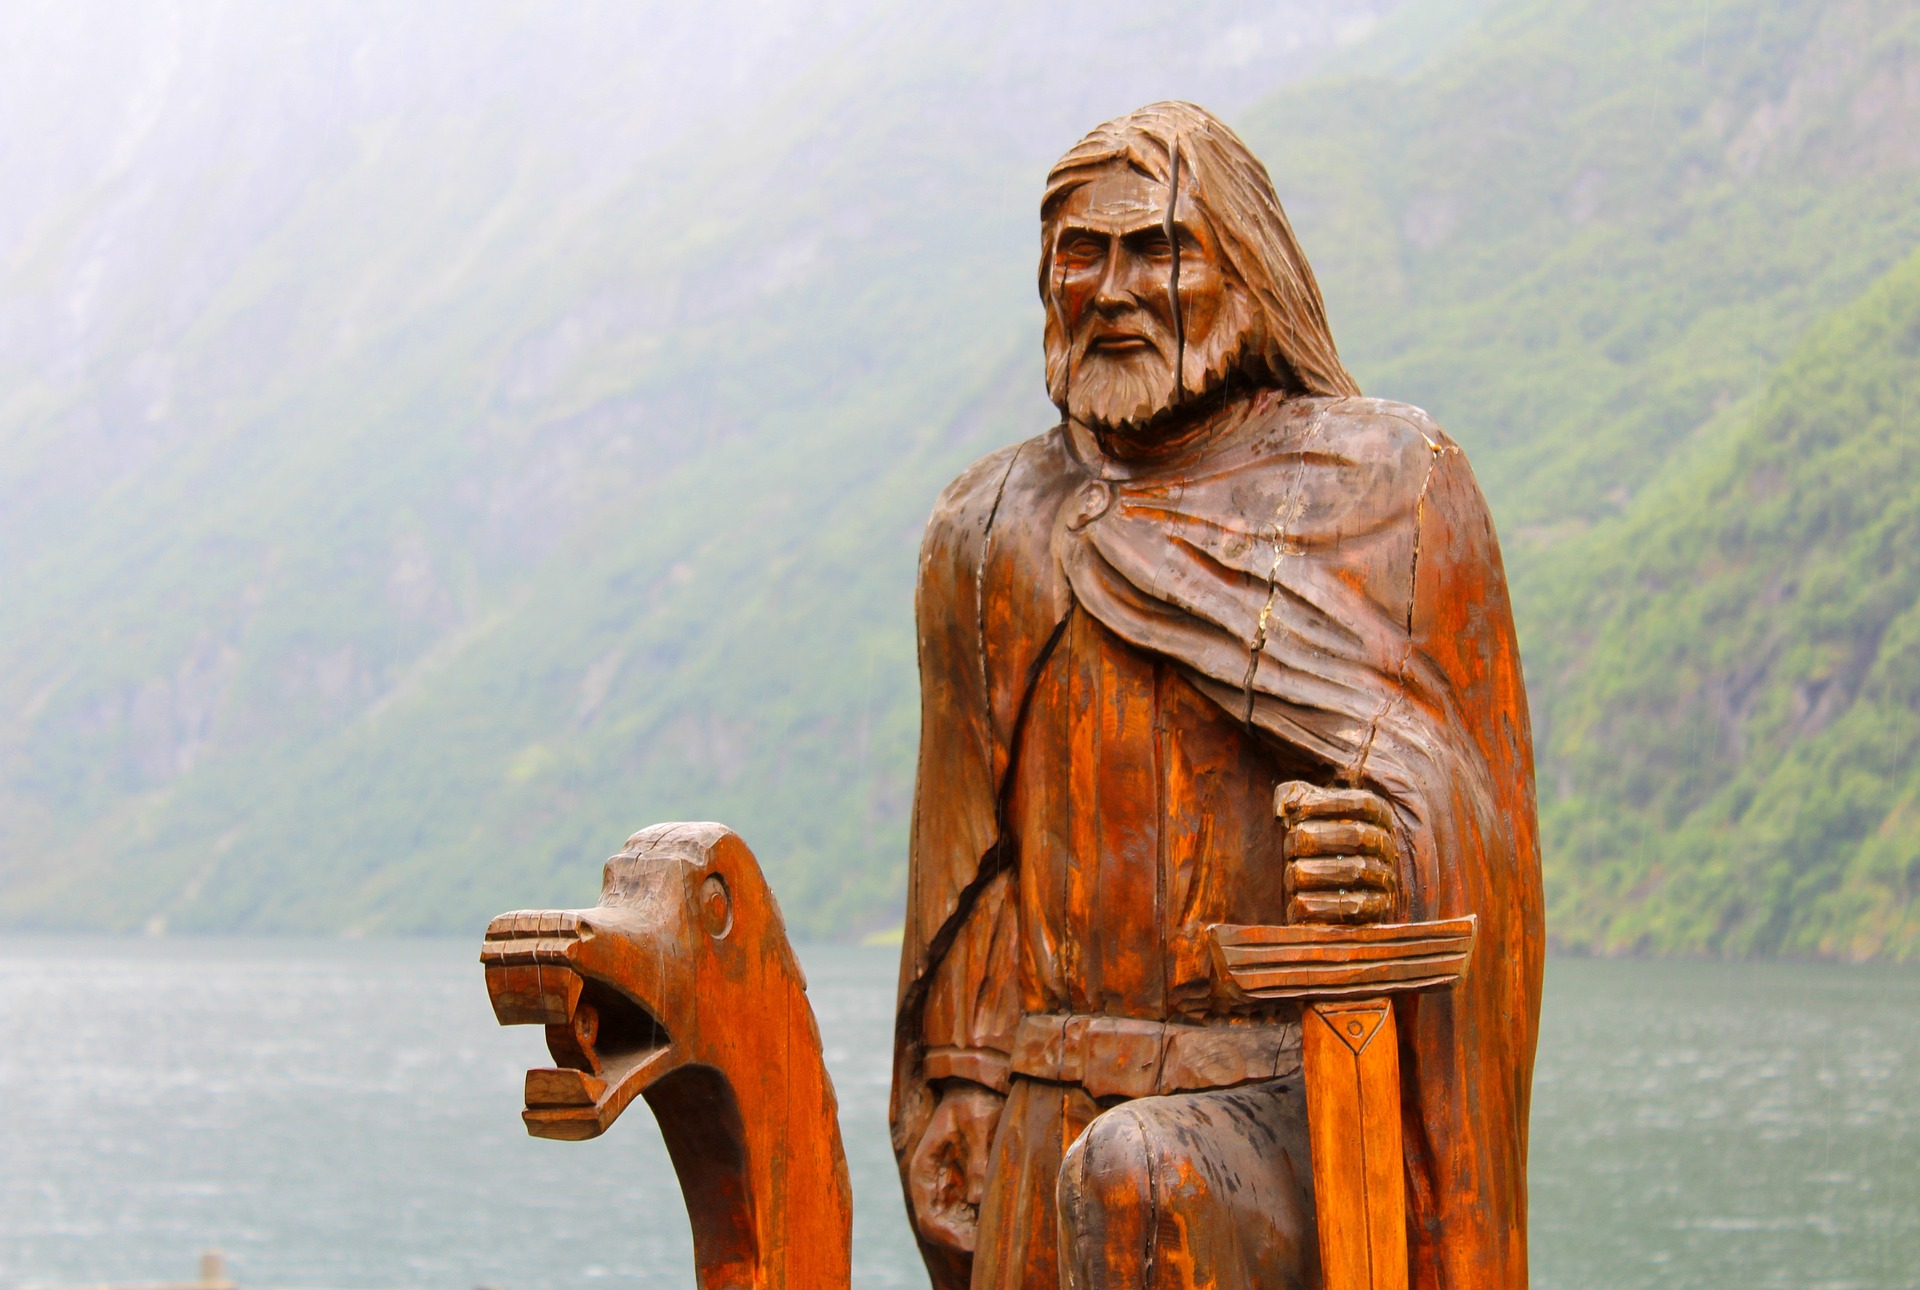 Norvège - Nærøyfjord, sculpture bois